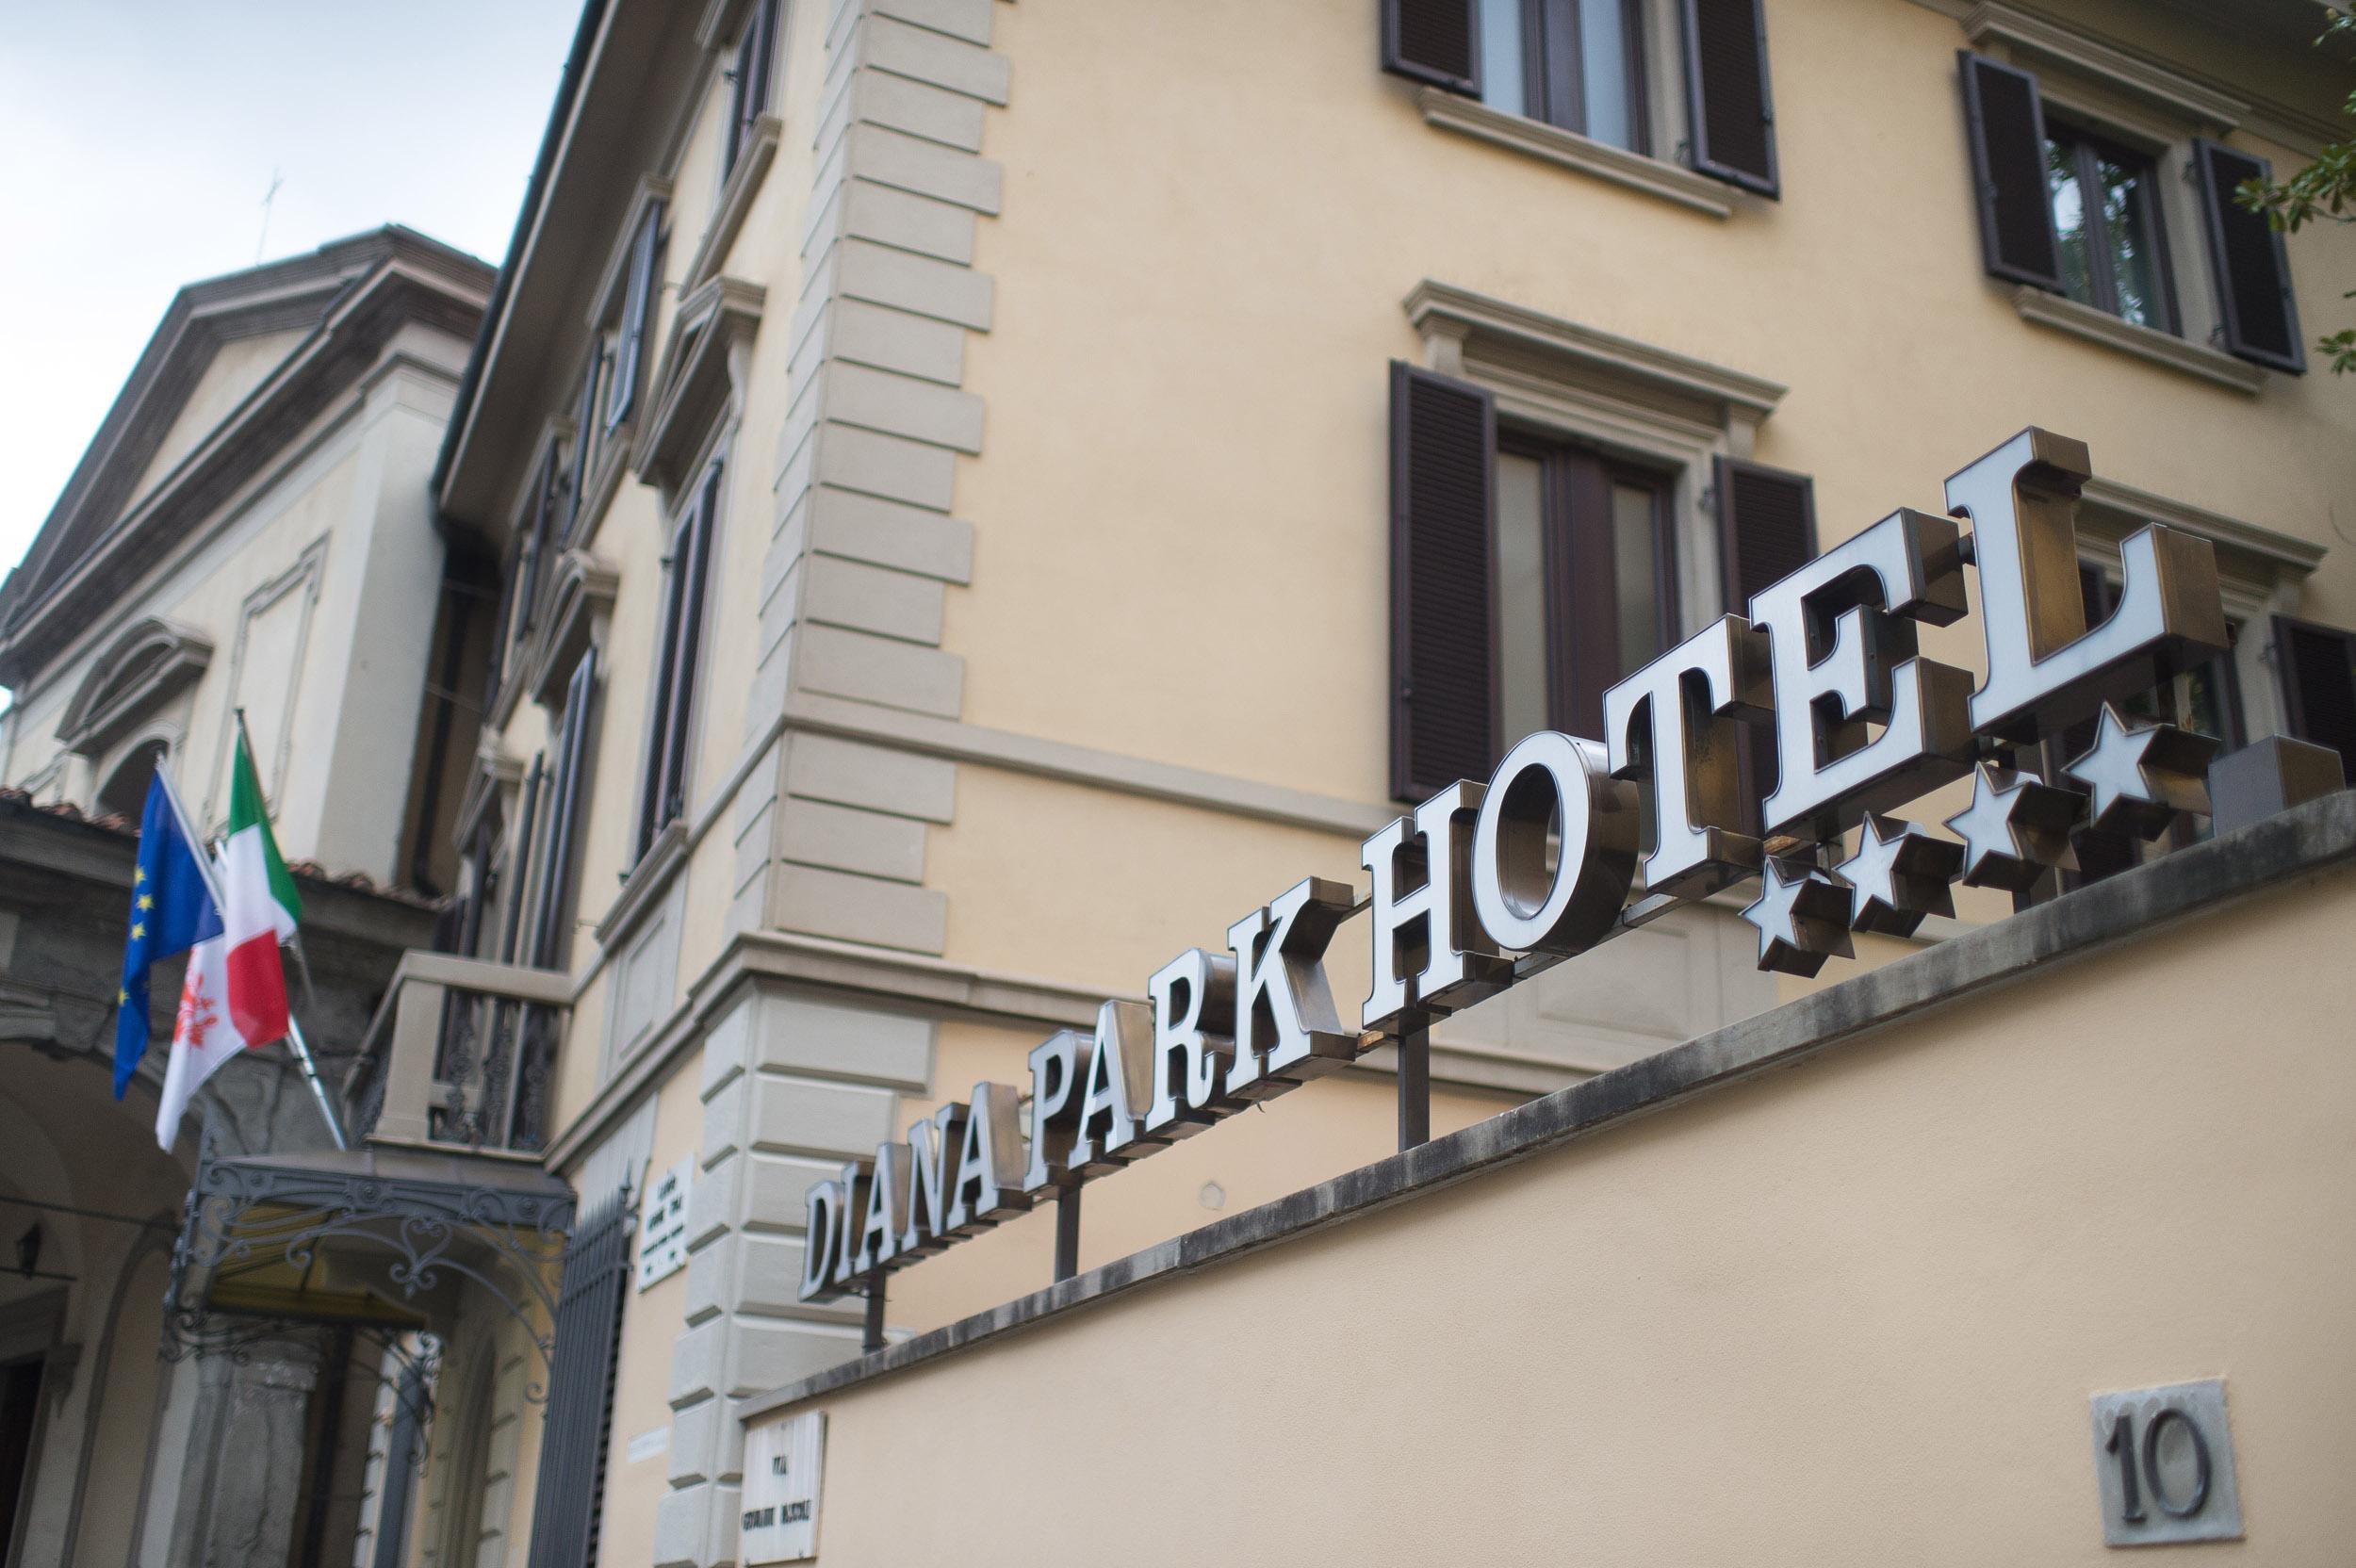 Diana Park Hotel 4 Star Hotel Florence